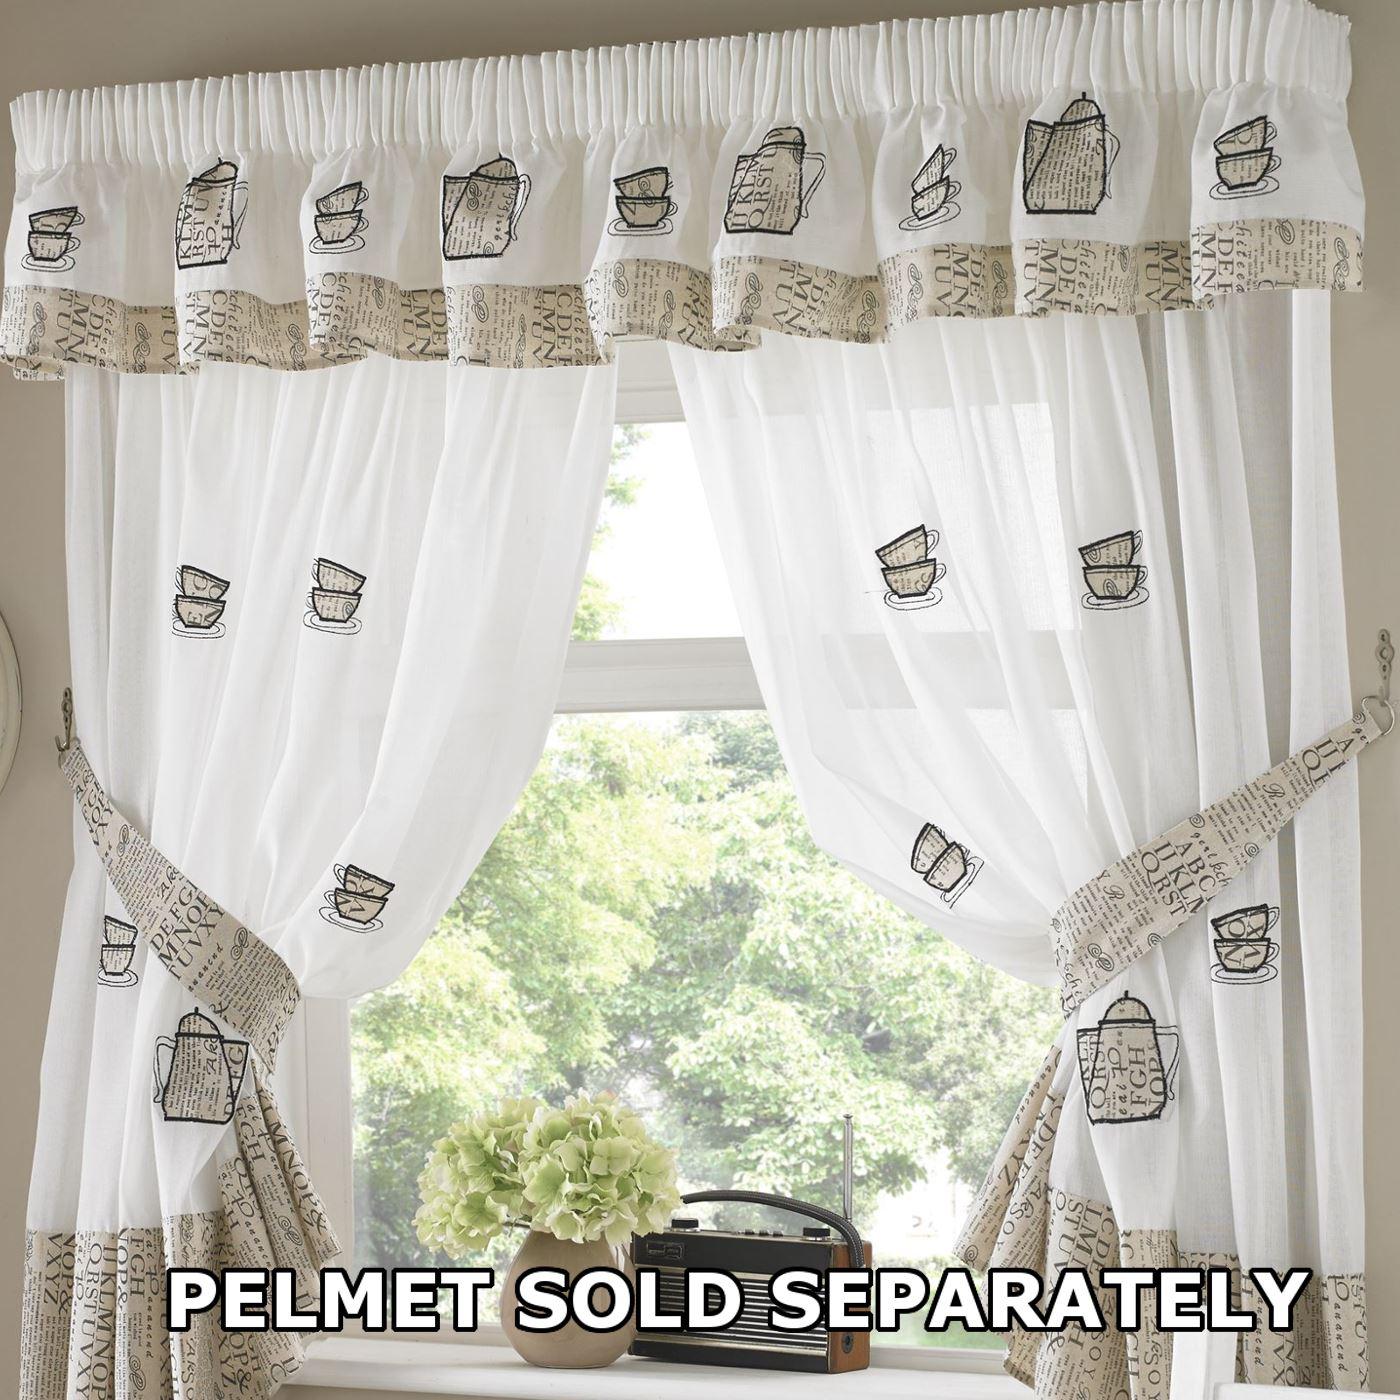 Küche Fenster Gardinen Paar Voile oder passend Querbehänge bestickt ...